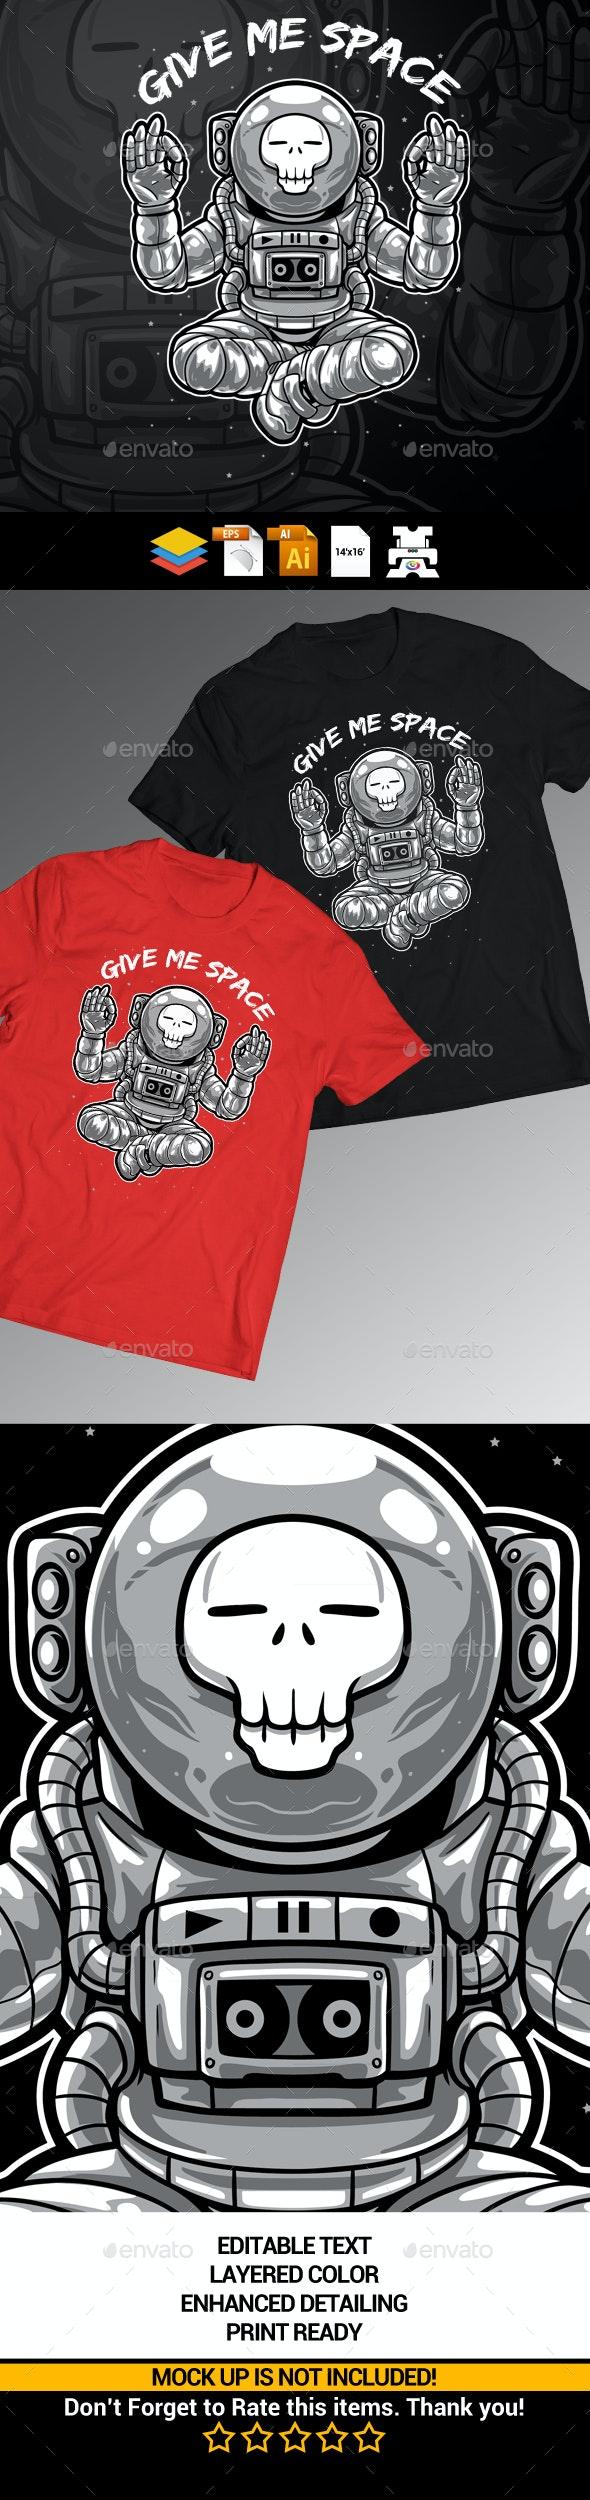 Give Me Space - Astronaut T-shirt Design - Designs T-Shirts